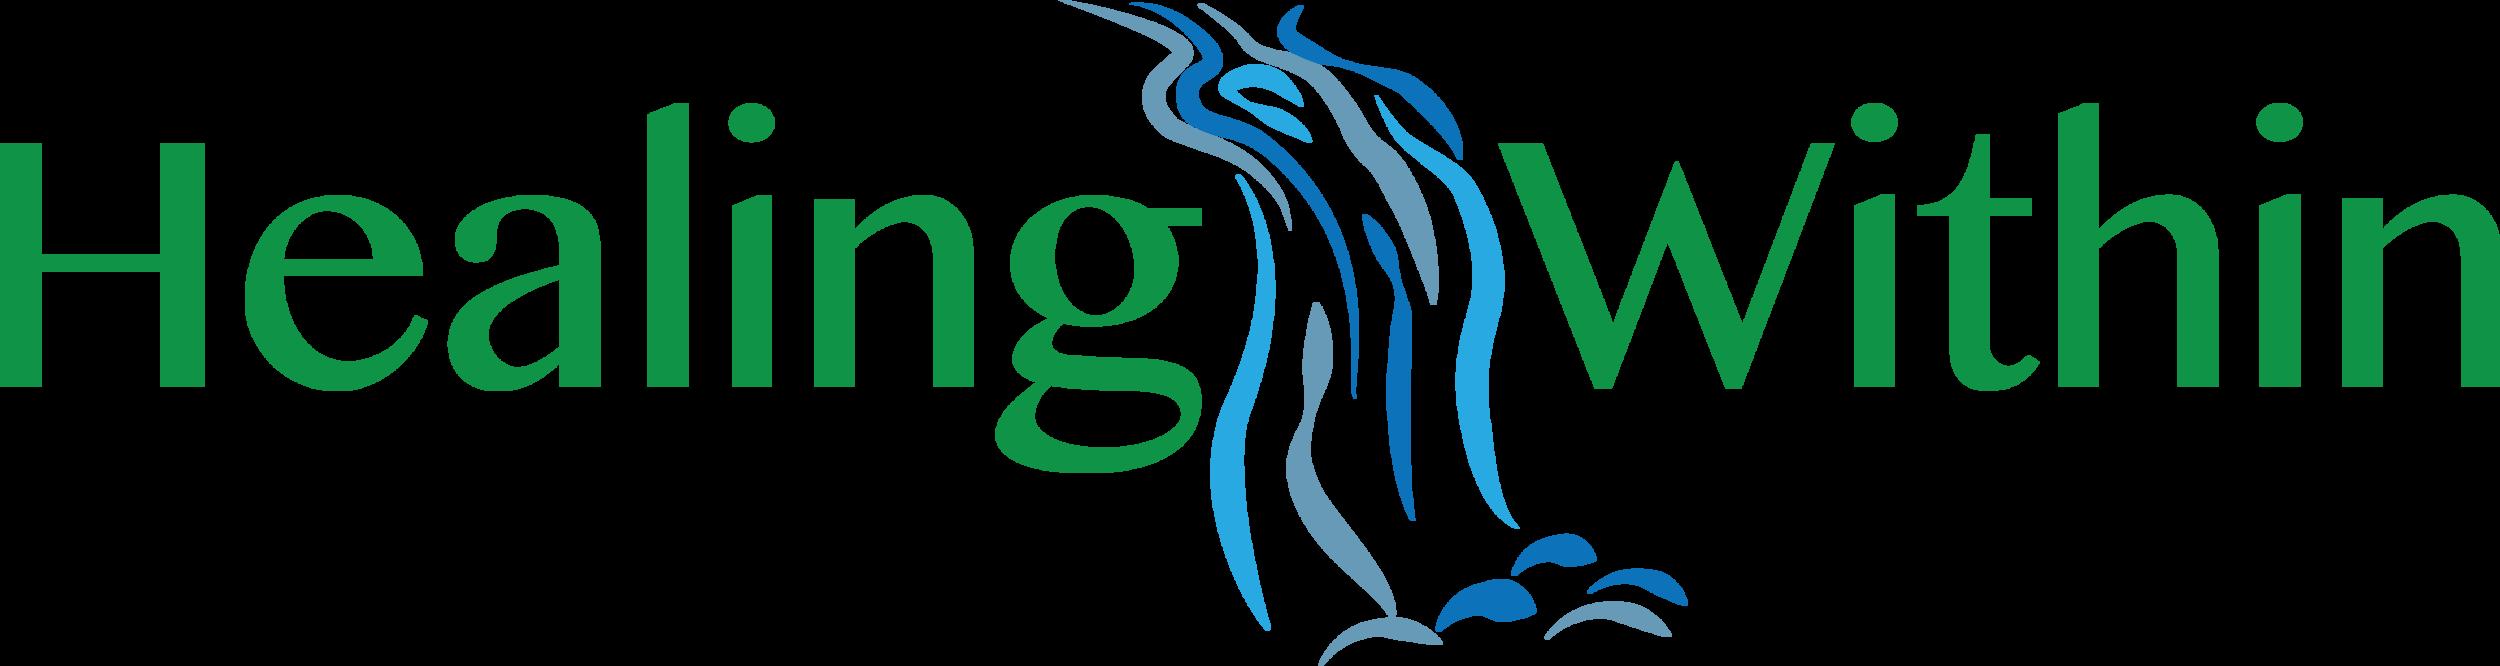 hw-logo (1).png